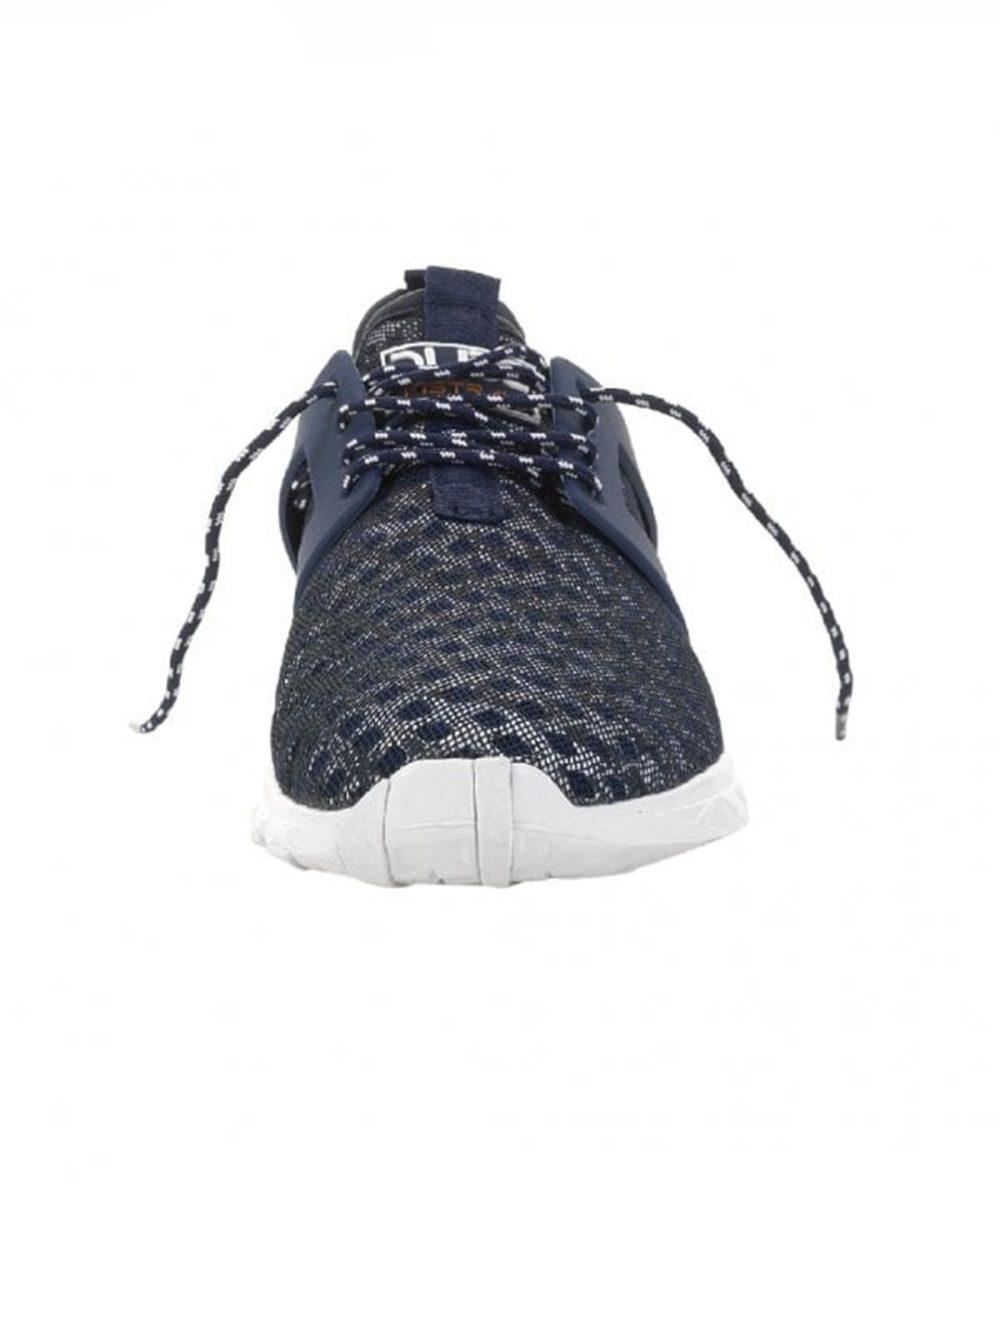 Mistral Navy Melange Airflow Hey Dude Shoes Katie Kerr Women's Clothing